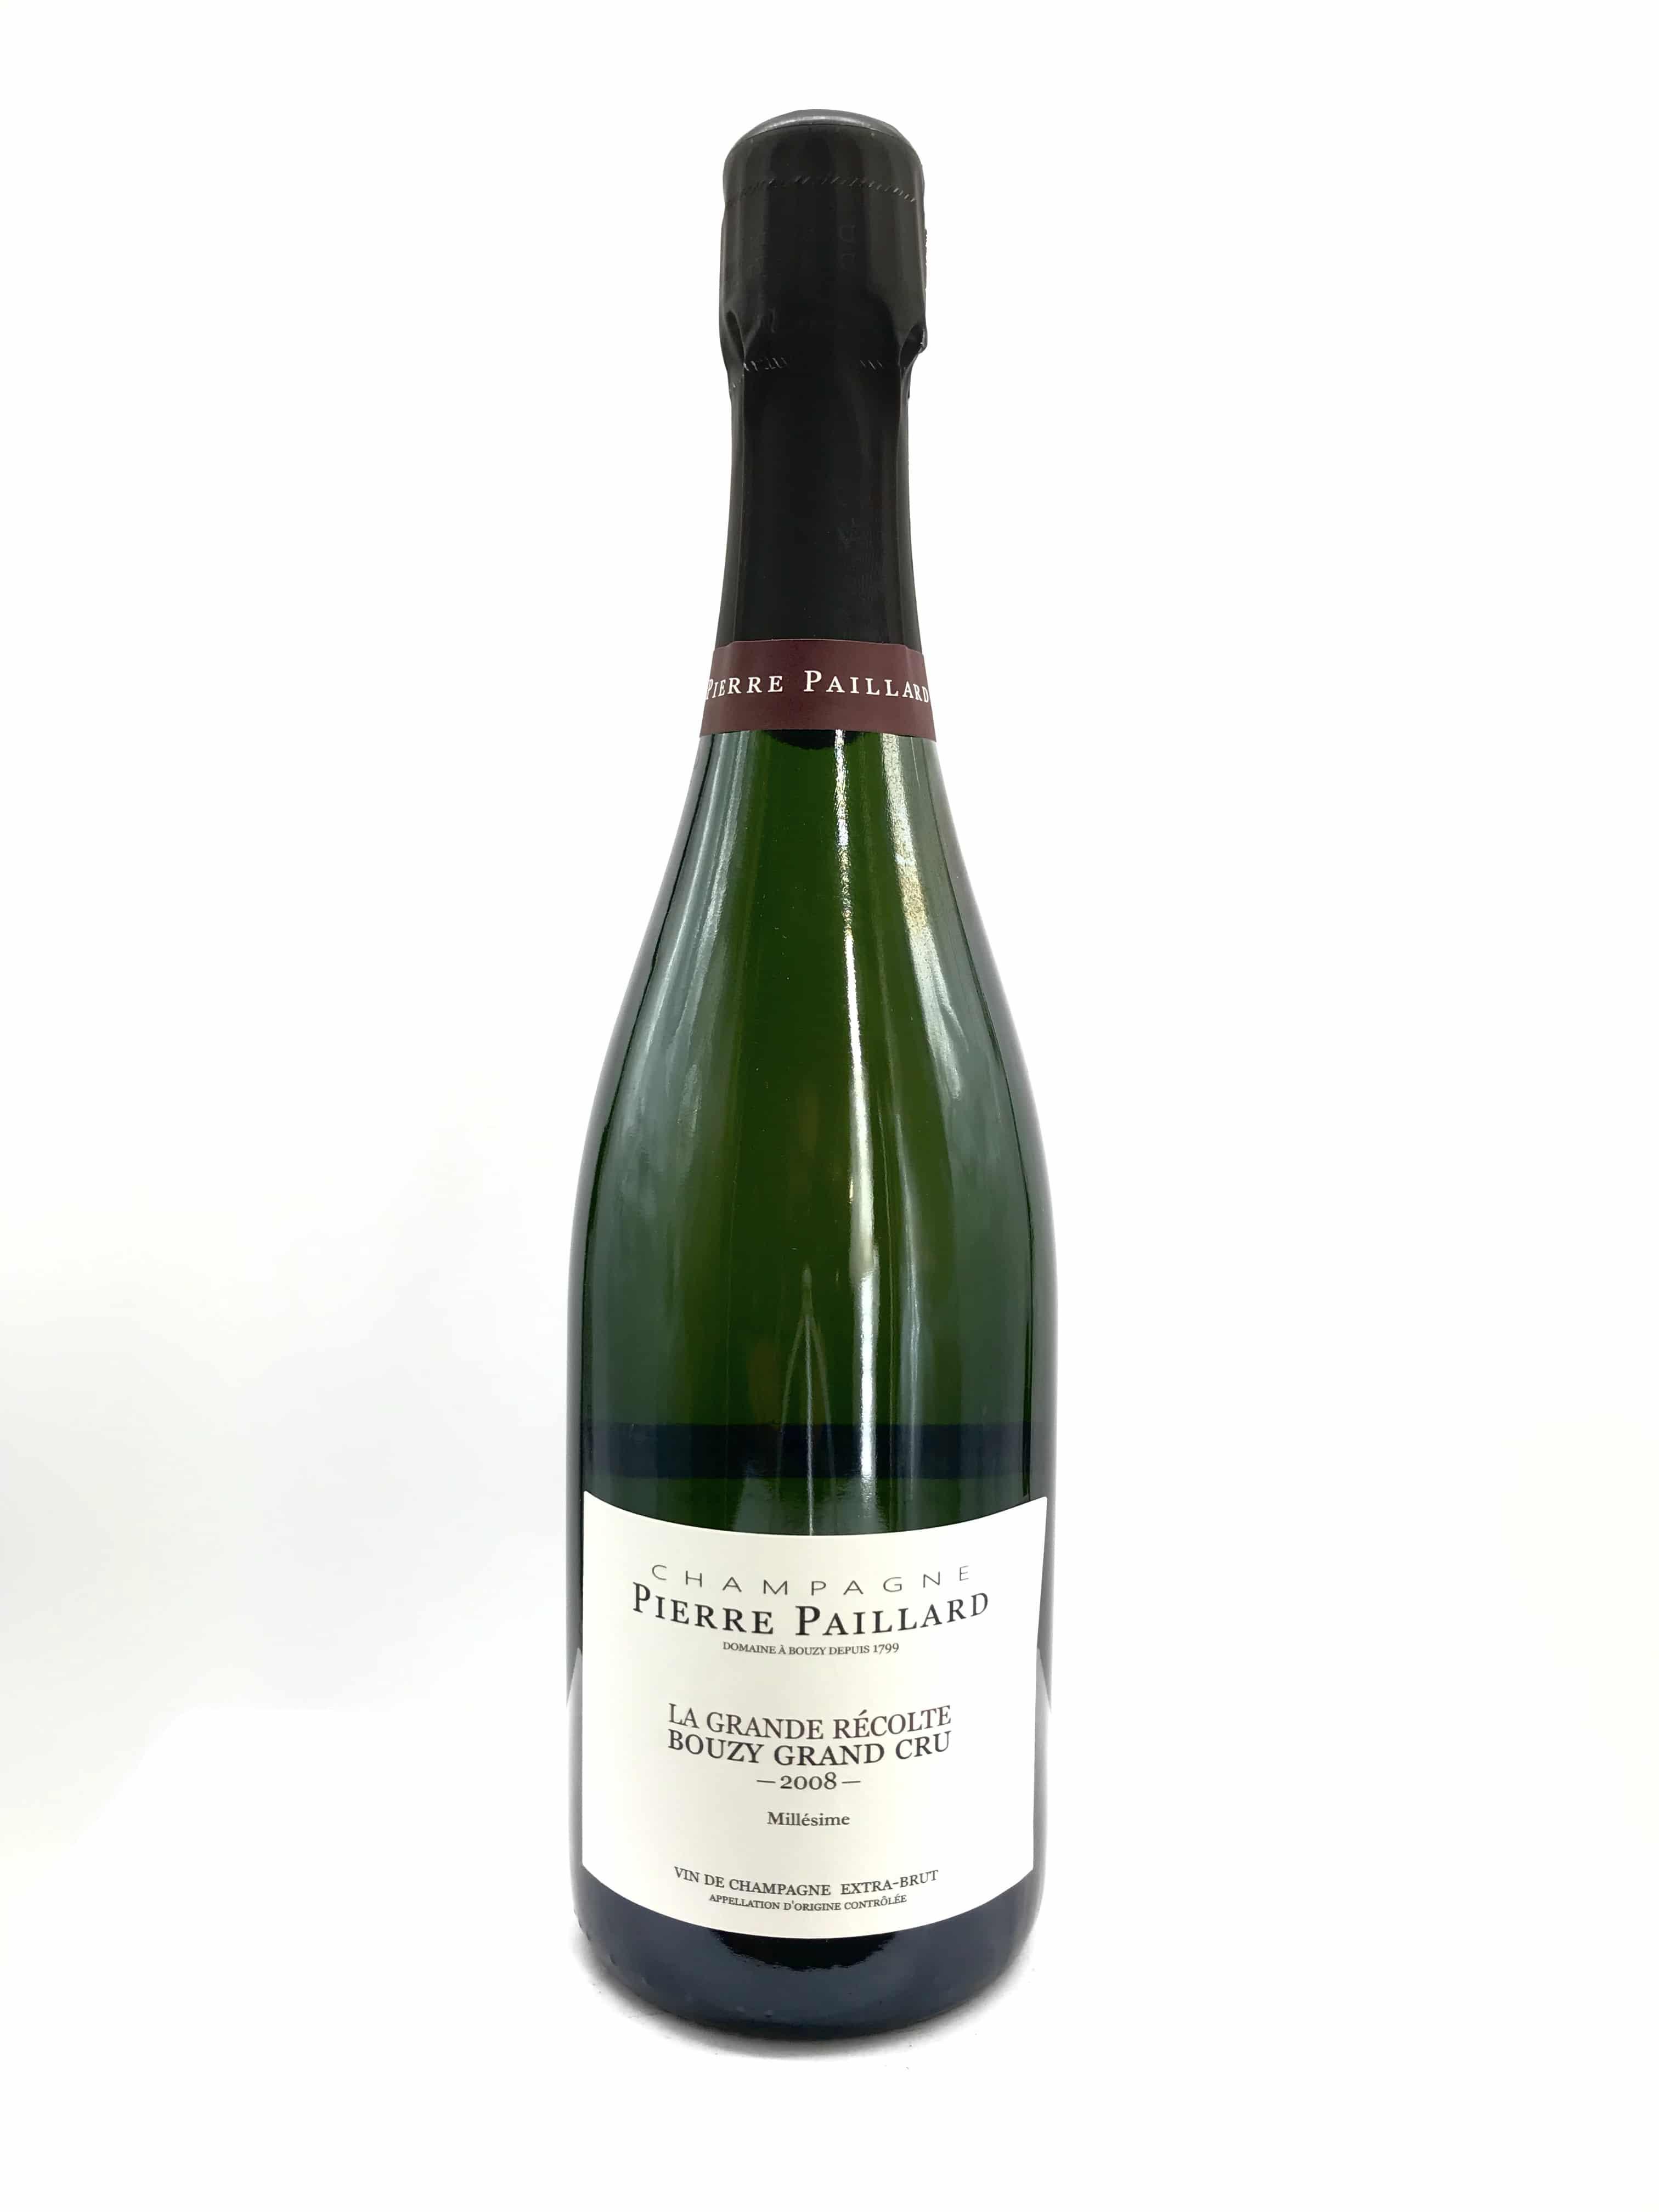 Champagne Pierre Paillard La Grande Recolte Bouzy Grand Cru